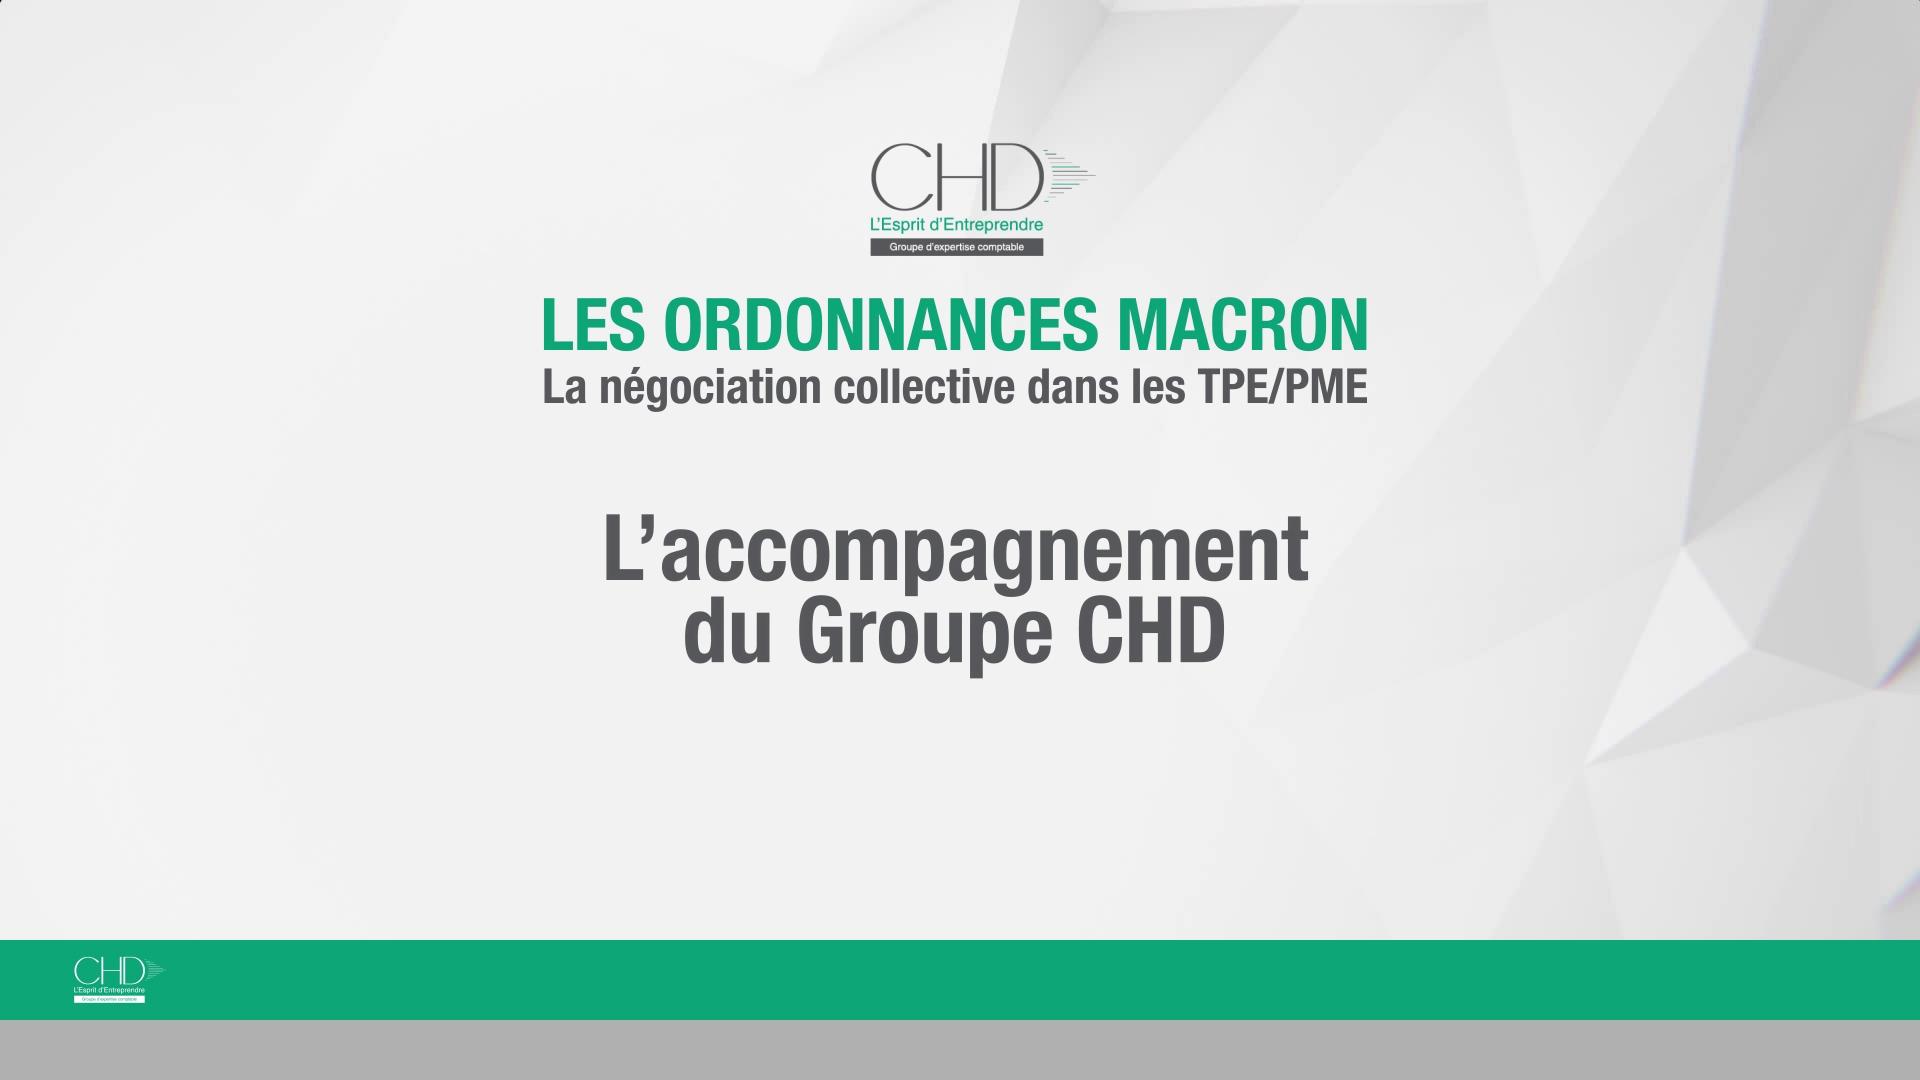 ordonnances-macron-accompagnement-groupe-chd